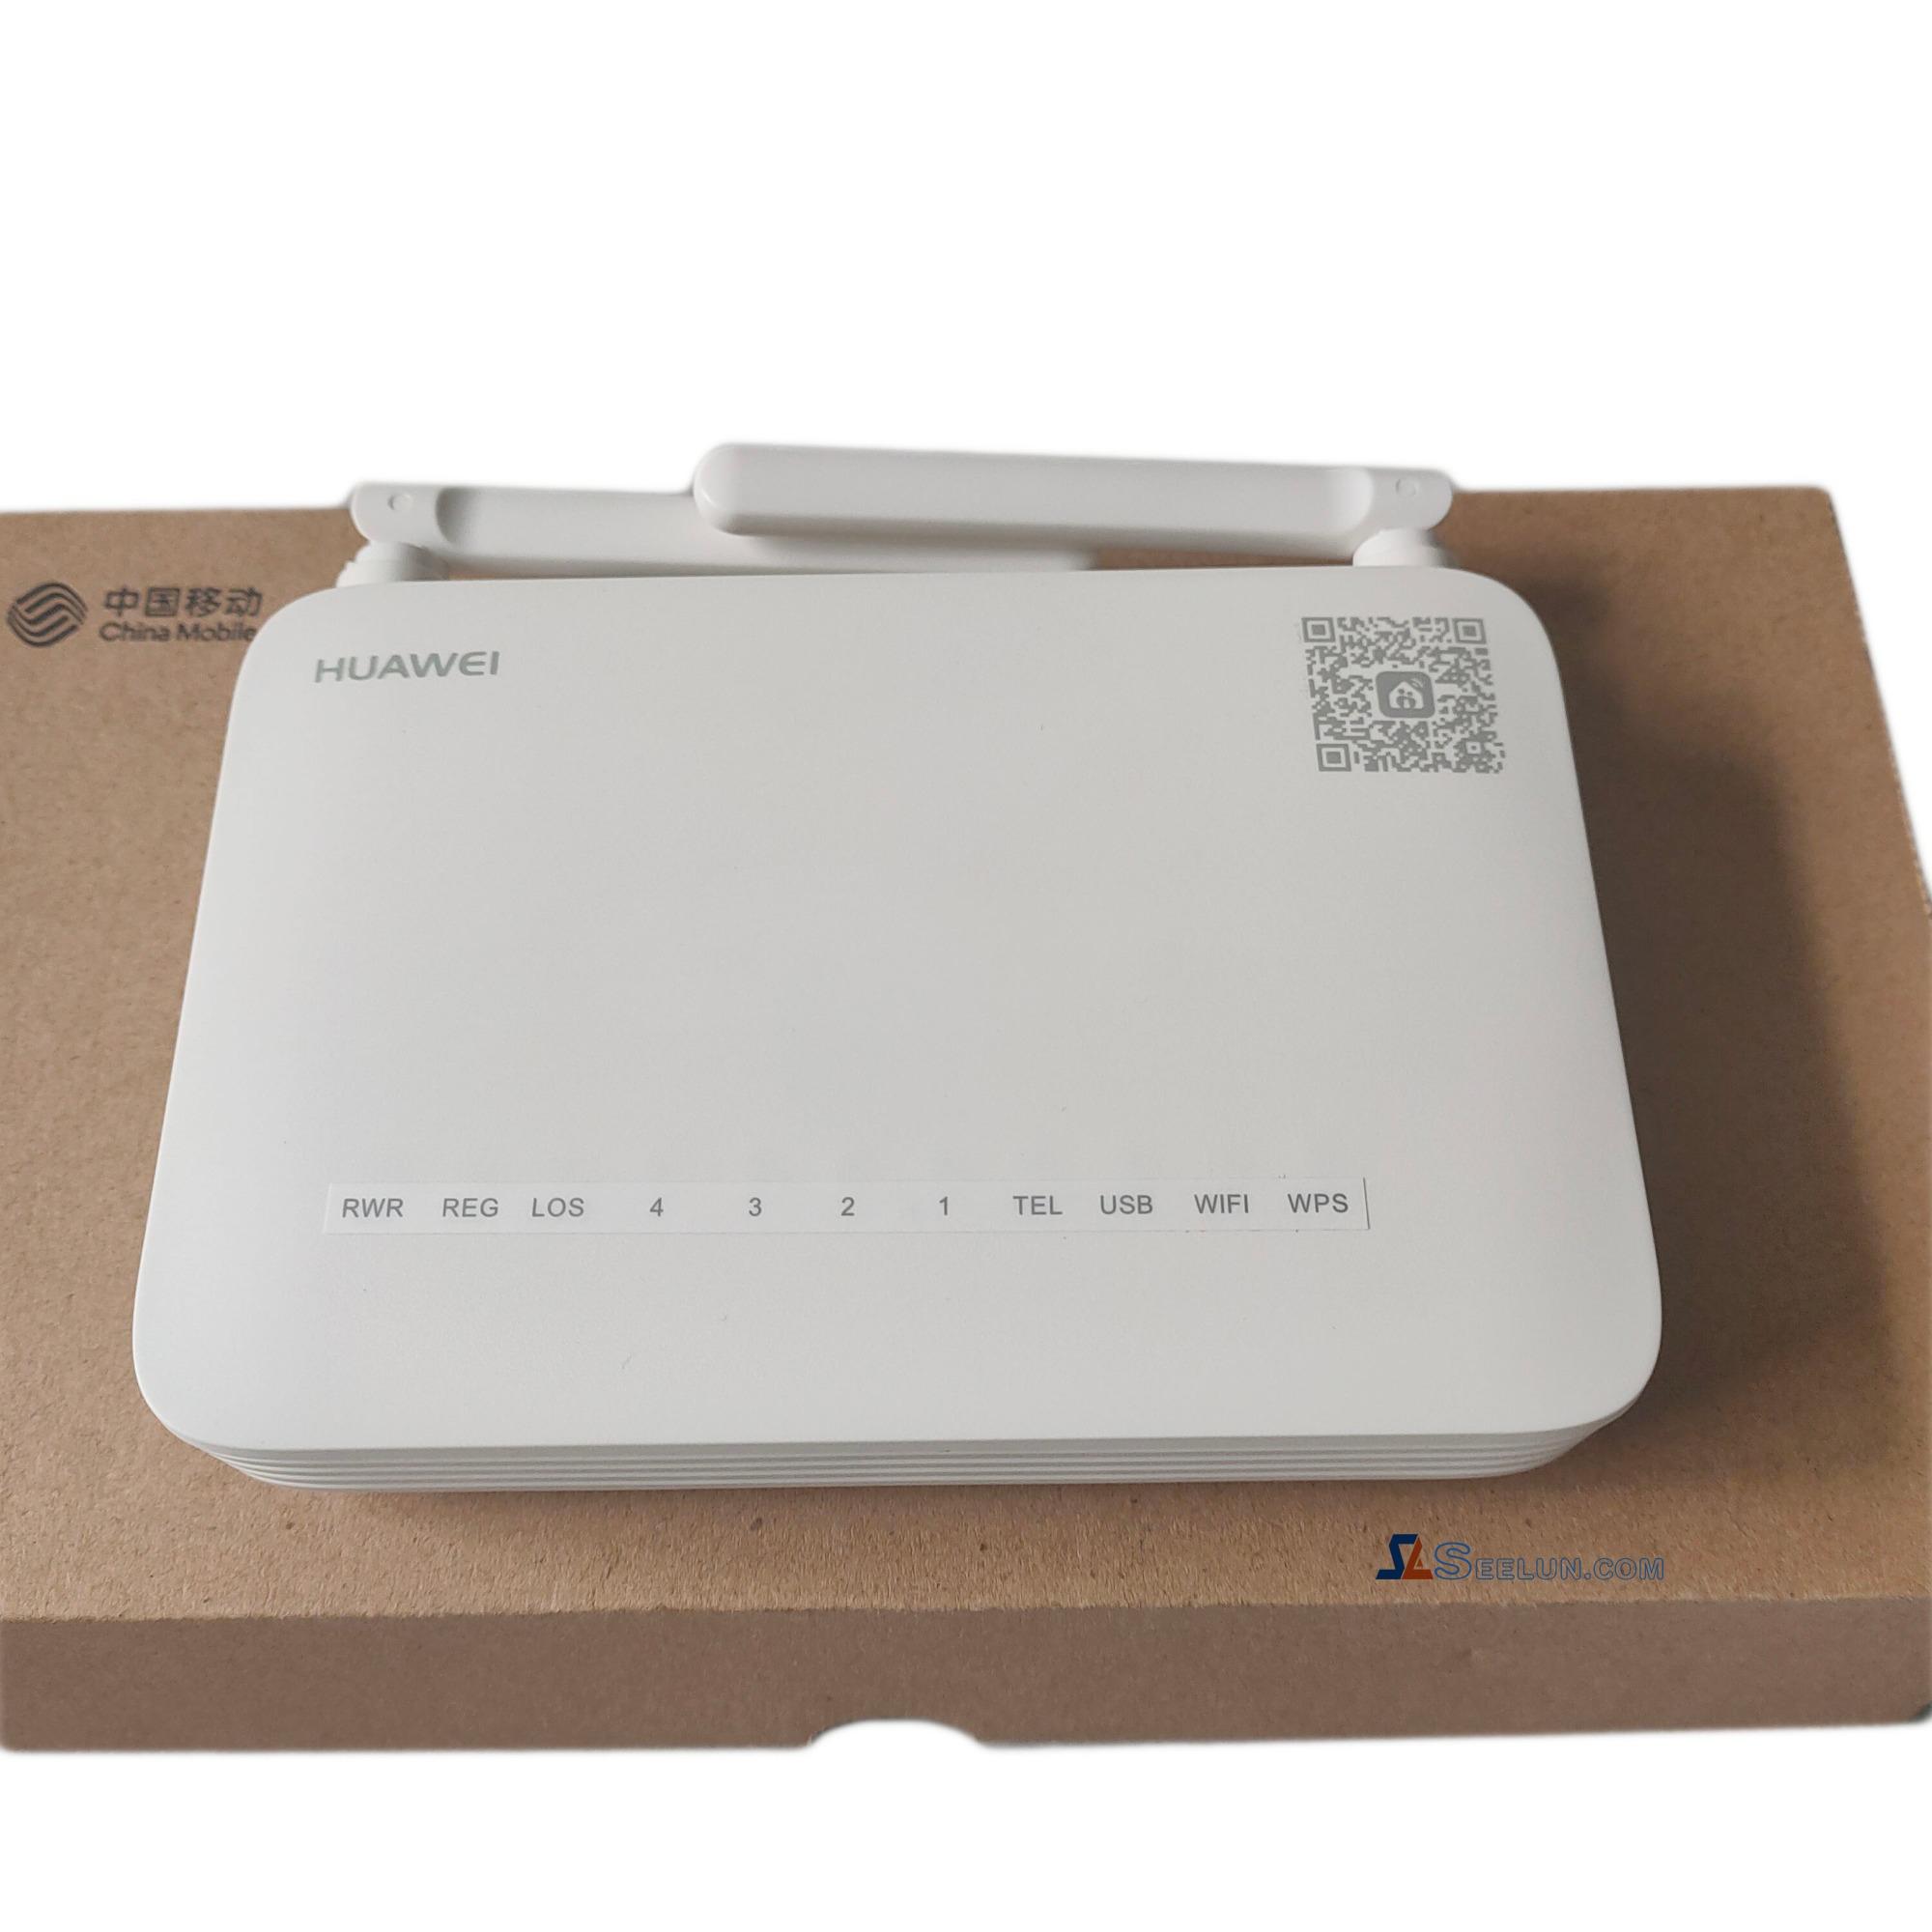 1GE+3FE+1POTS+1USB+WIFI best Cheapest Huawei GPON ONU HS8545M5